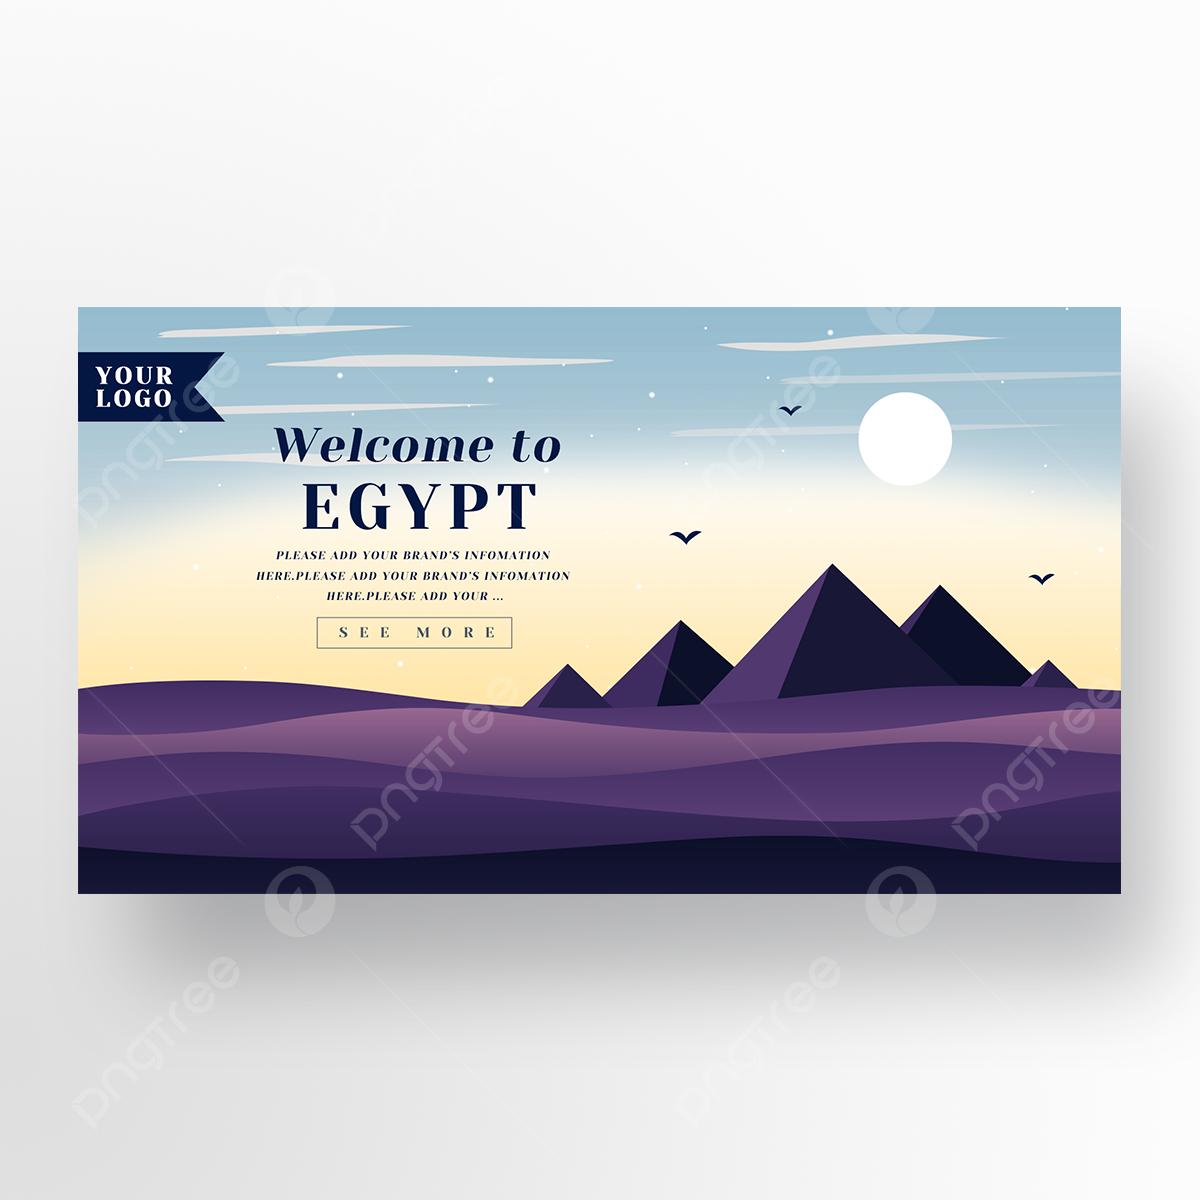 Sunset Egypt Tourism Promotion Website Template Download On Pngtree